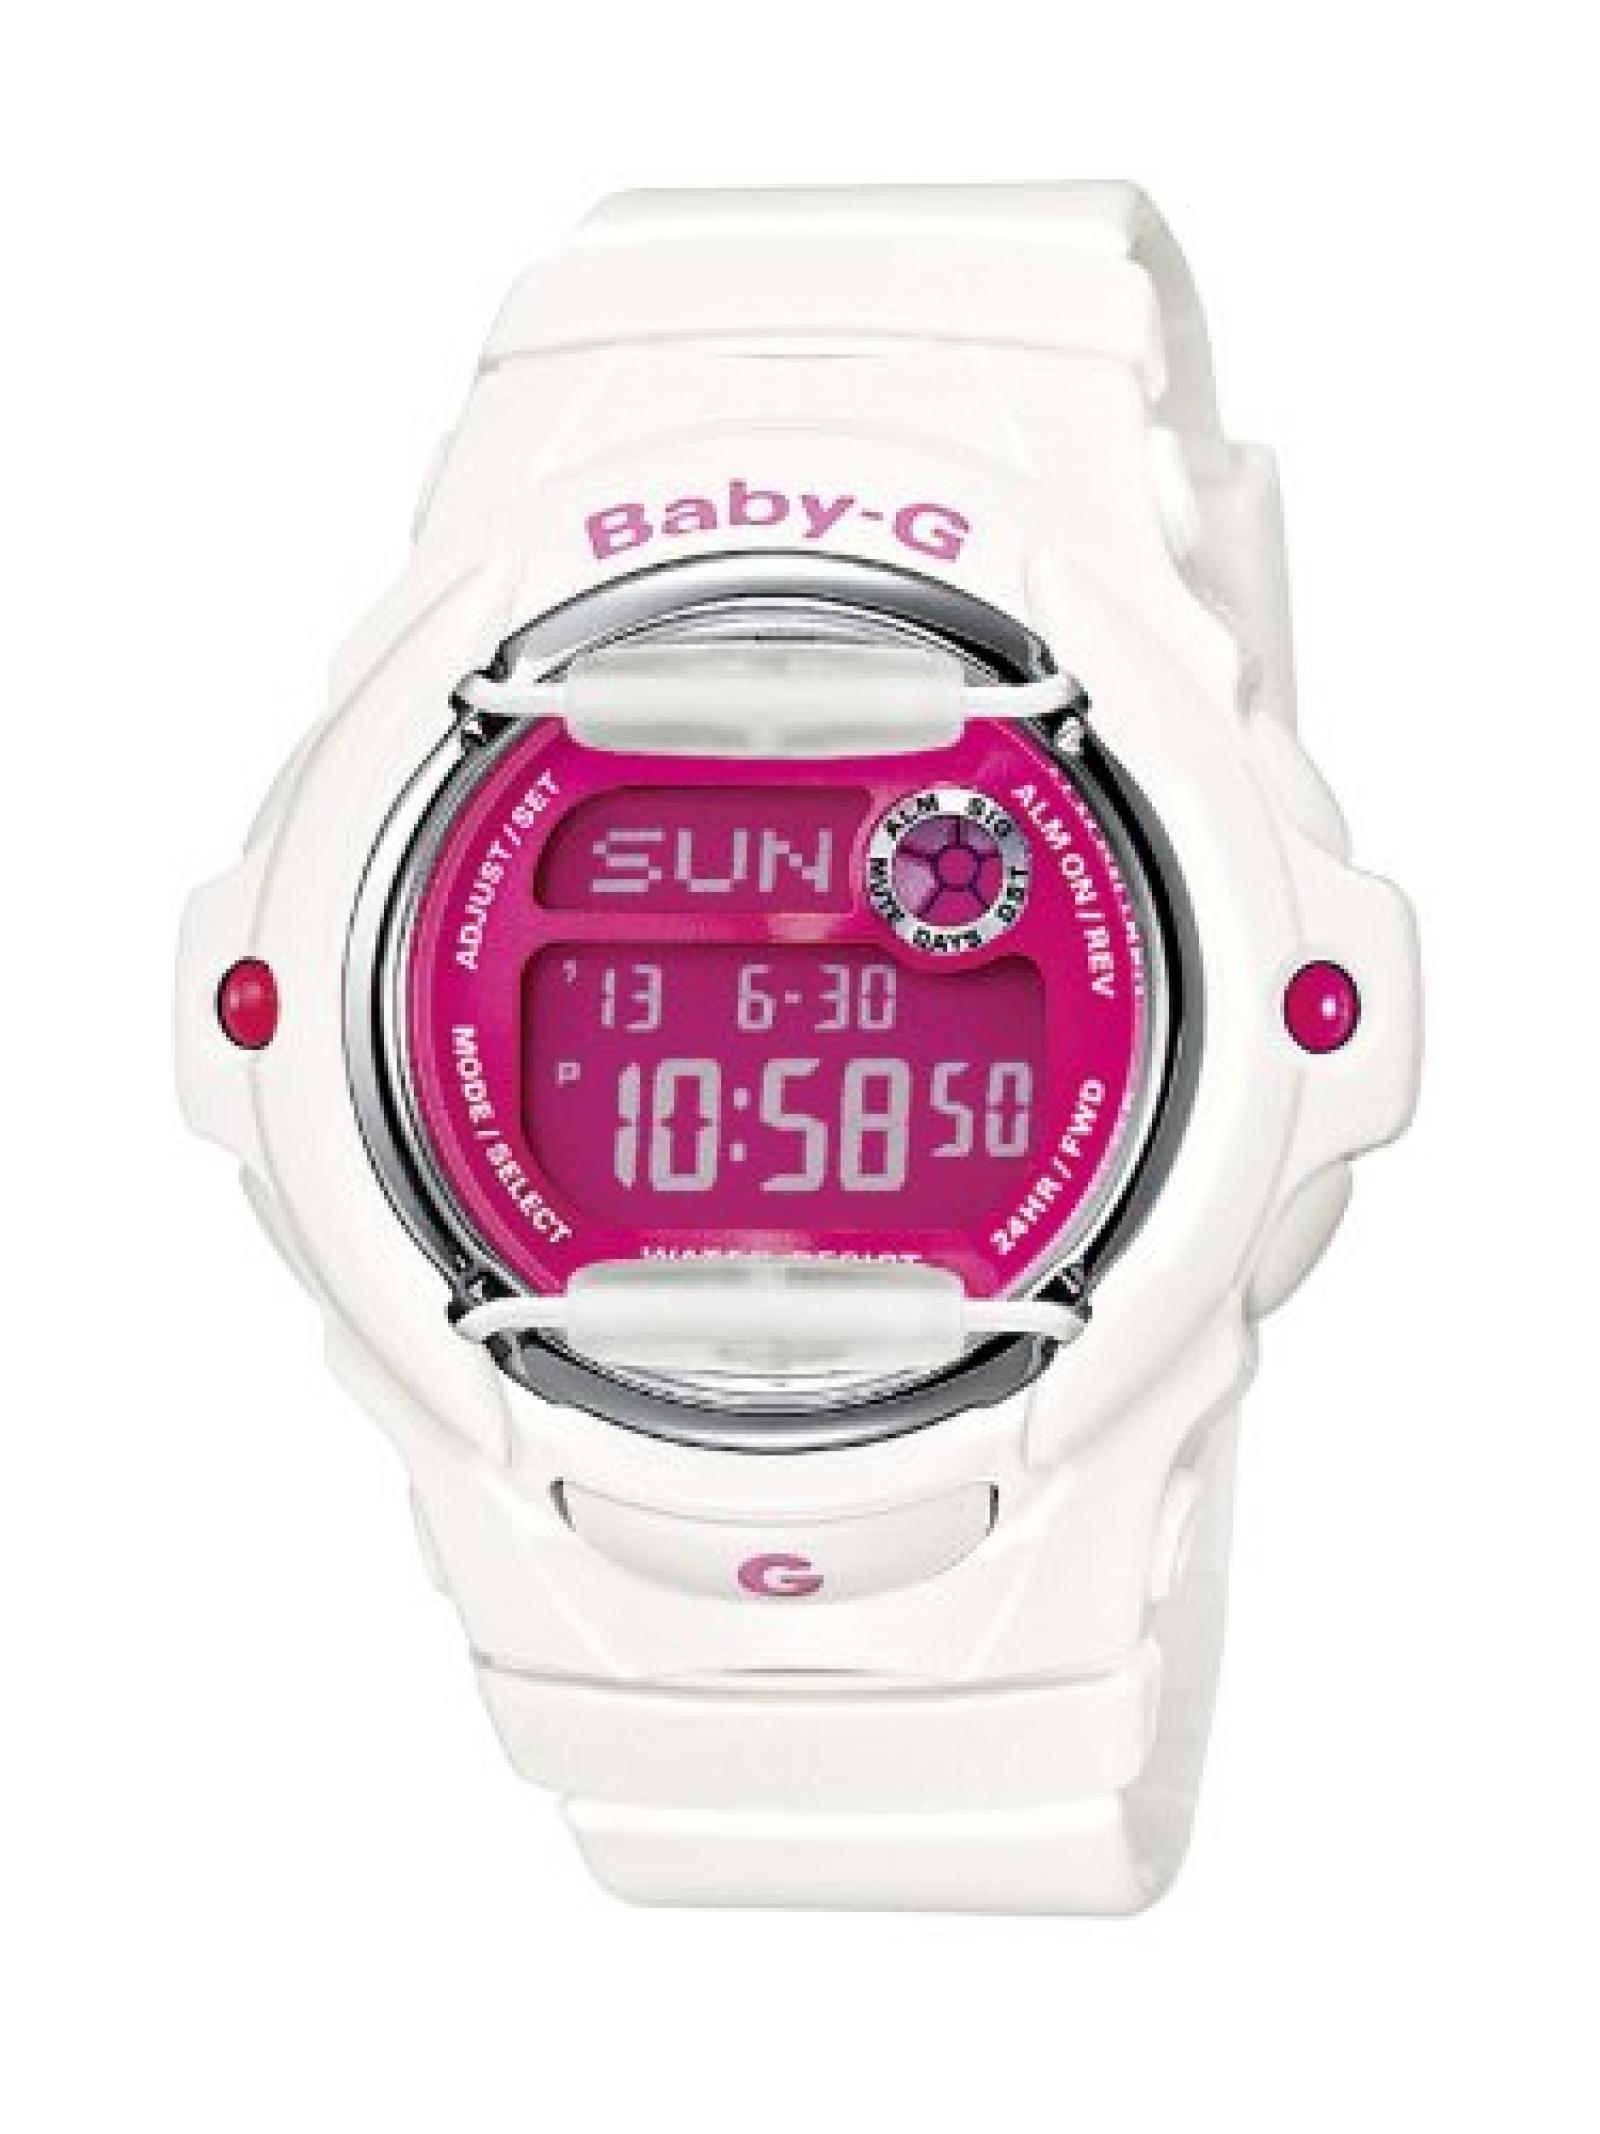 Casio Baby-G Damen-Armbanduhr weiß Digital Quarz BG-169R-7DER